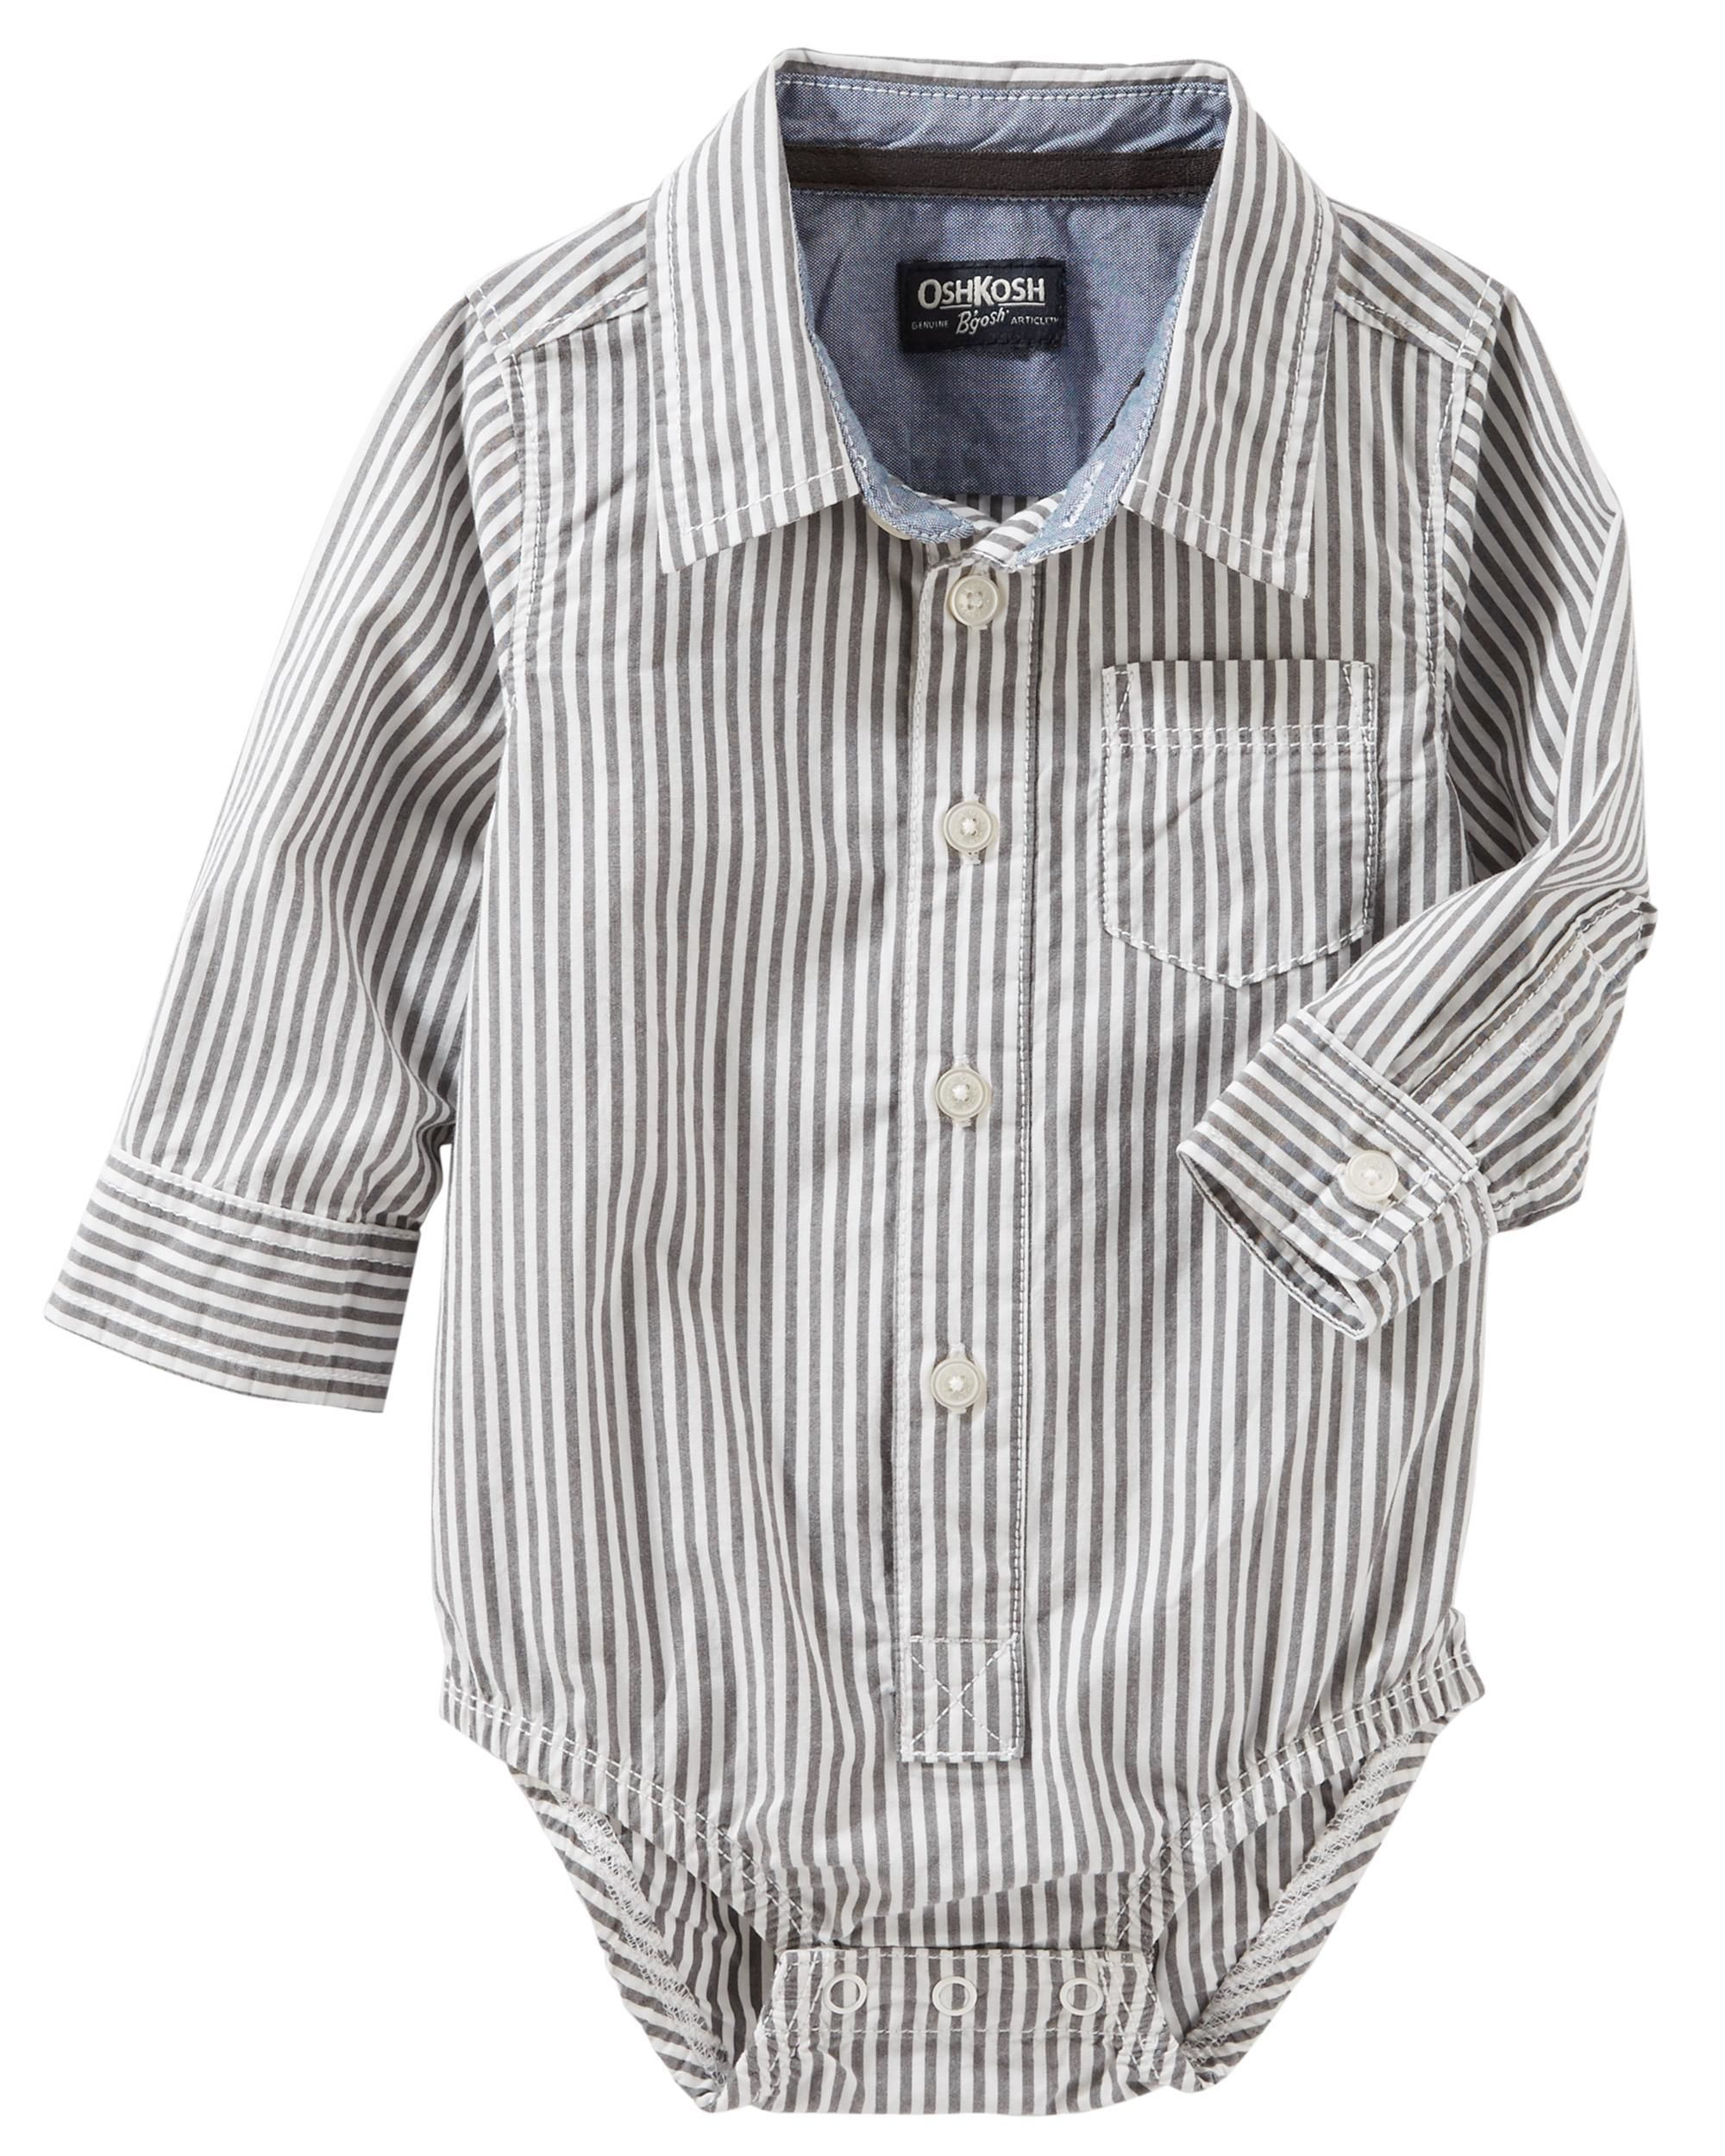 bf02f0b7 Toddler White Dress Shirt Bodysuit   Kuenzi Turf & Nursery